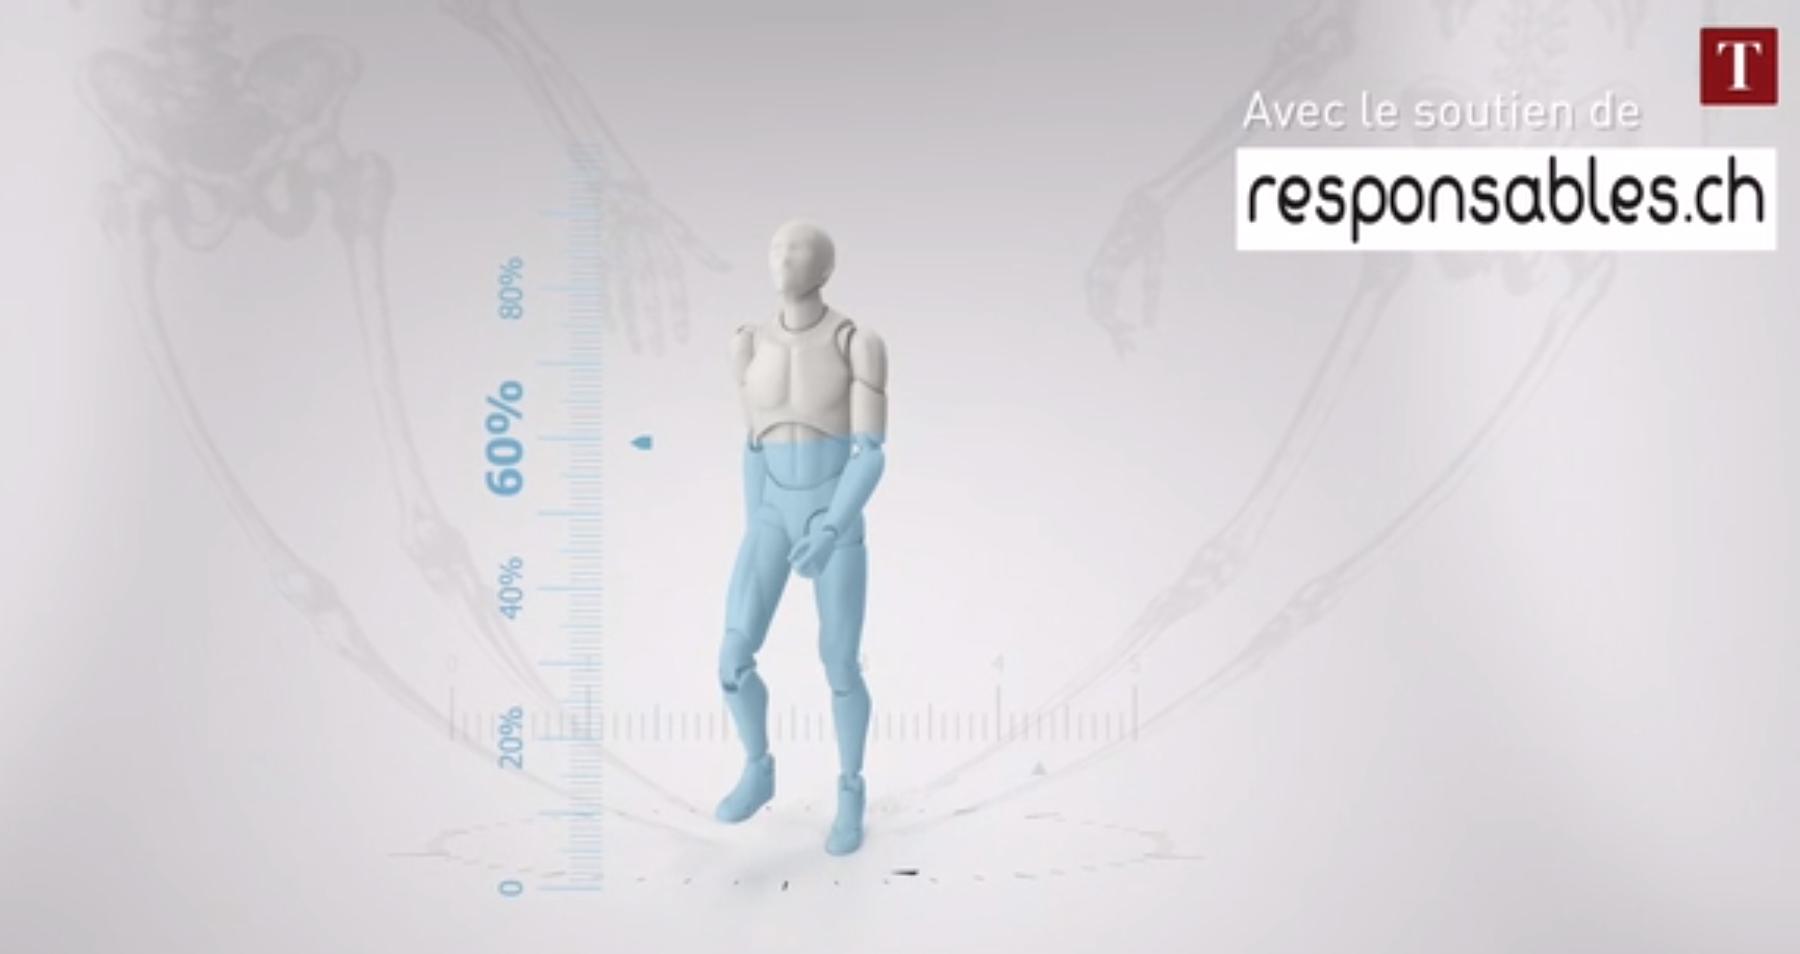 https://www.letemps.ch/images/video/societe/boiton-toujours-leau-bouteille?playvideo=1